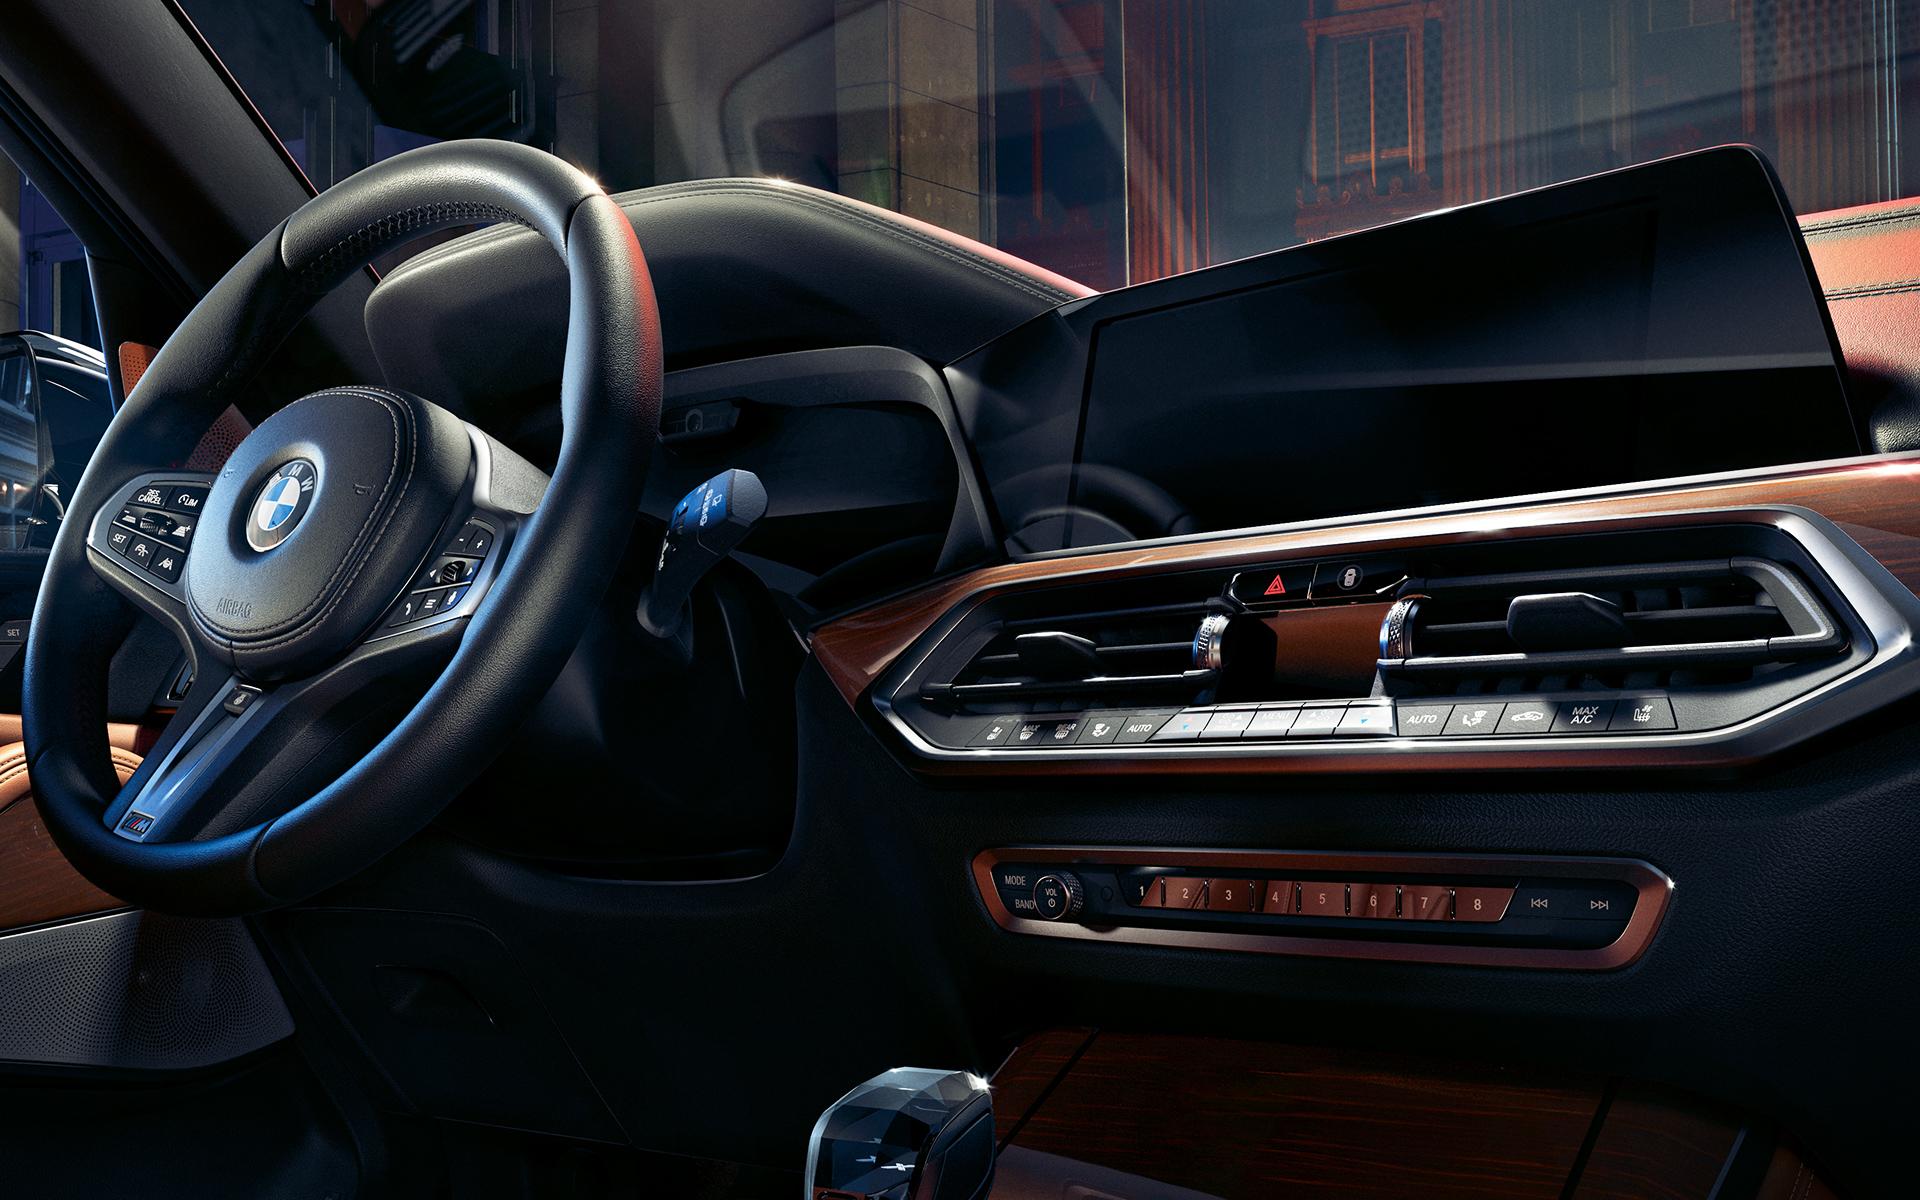 BMWX5gallery3.jpg